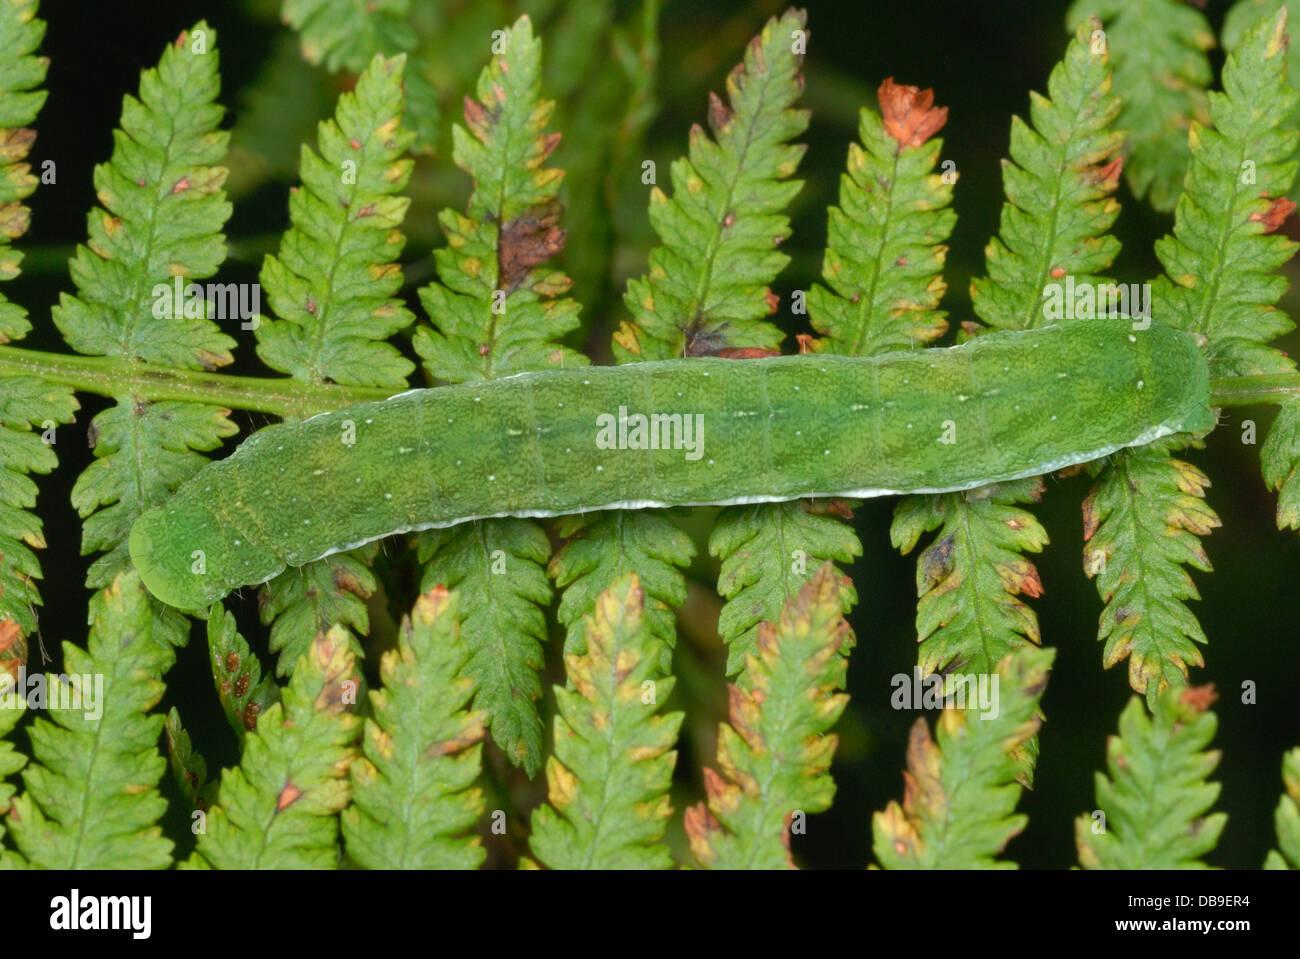 Petit angle de nuances moth (Euplexia lucipara caterpillar) sur une fronde de fougère Photo Stock